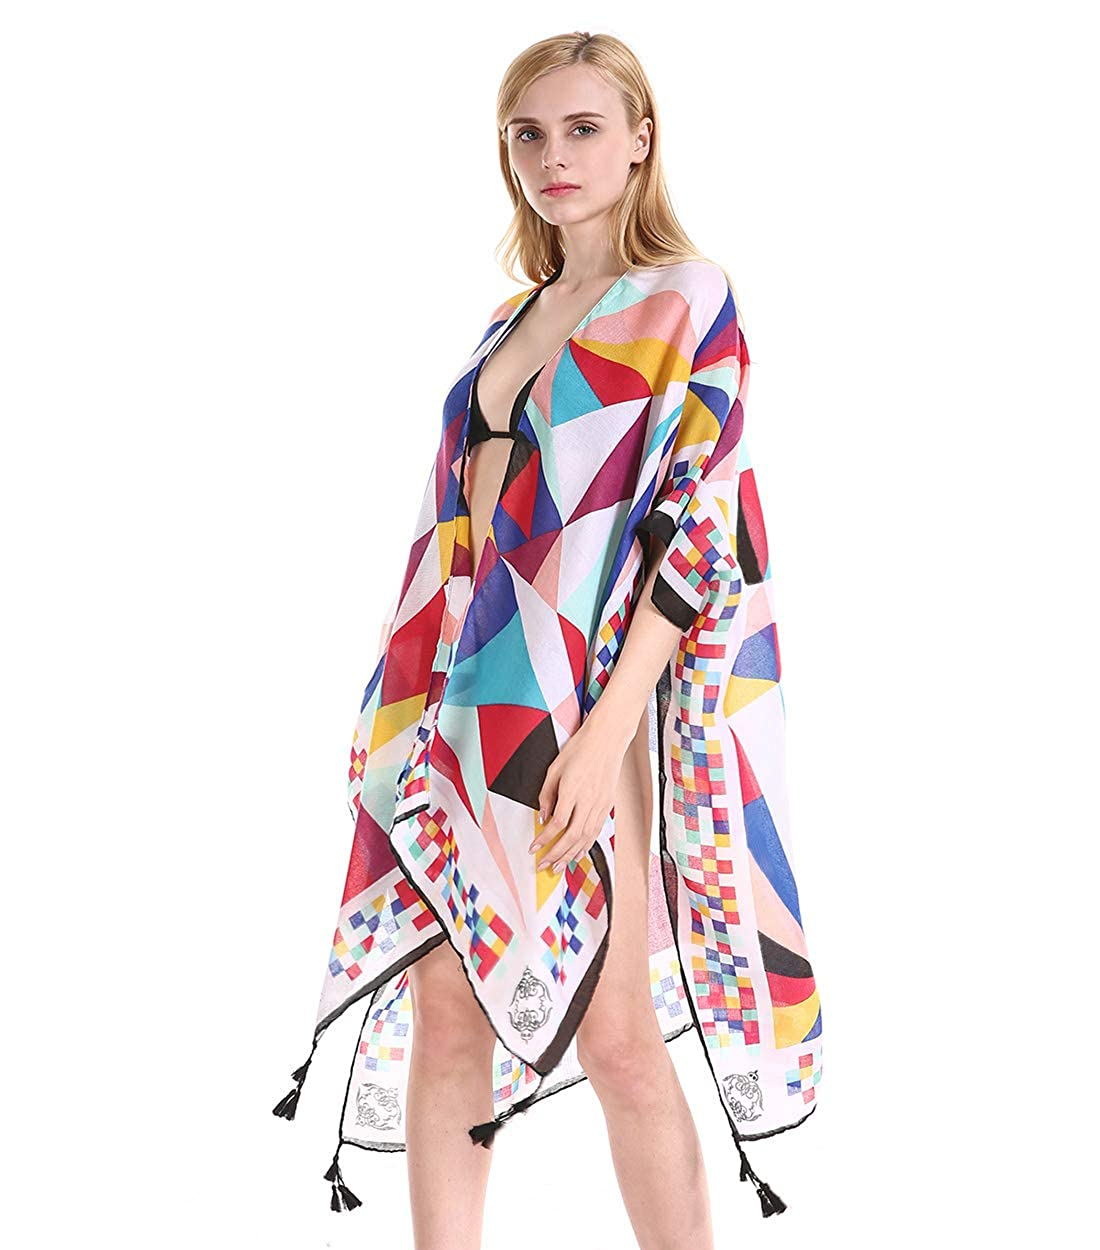 630d4d92ef6ce Women Floral Kimono Swimsuit Cover Up Cardigan - Long Chiffon Print  Swimwear Beach Bathing Bikini Coverup Boho Batwing Loose Tops Outwear Kimono  Dress Plus ...